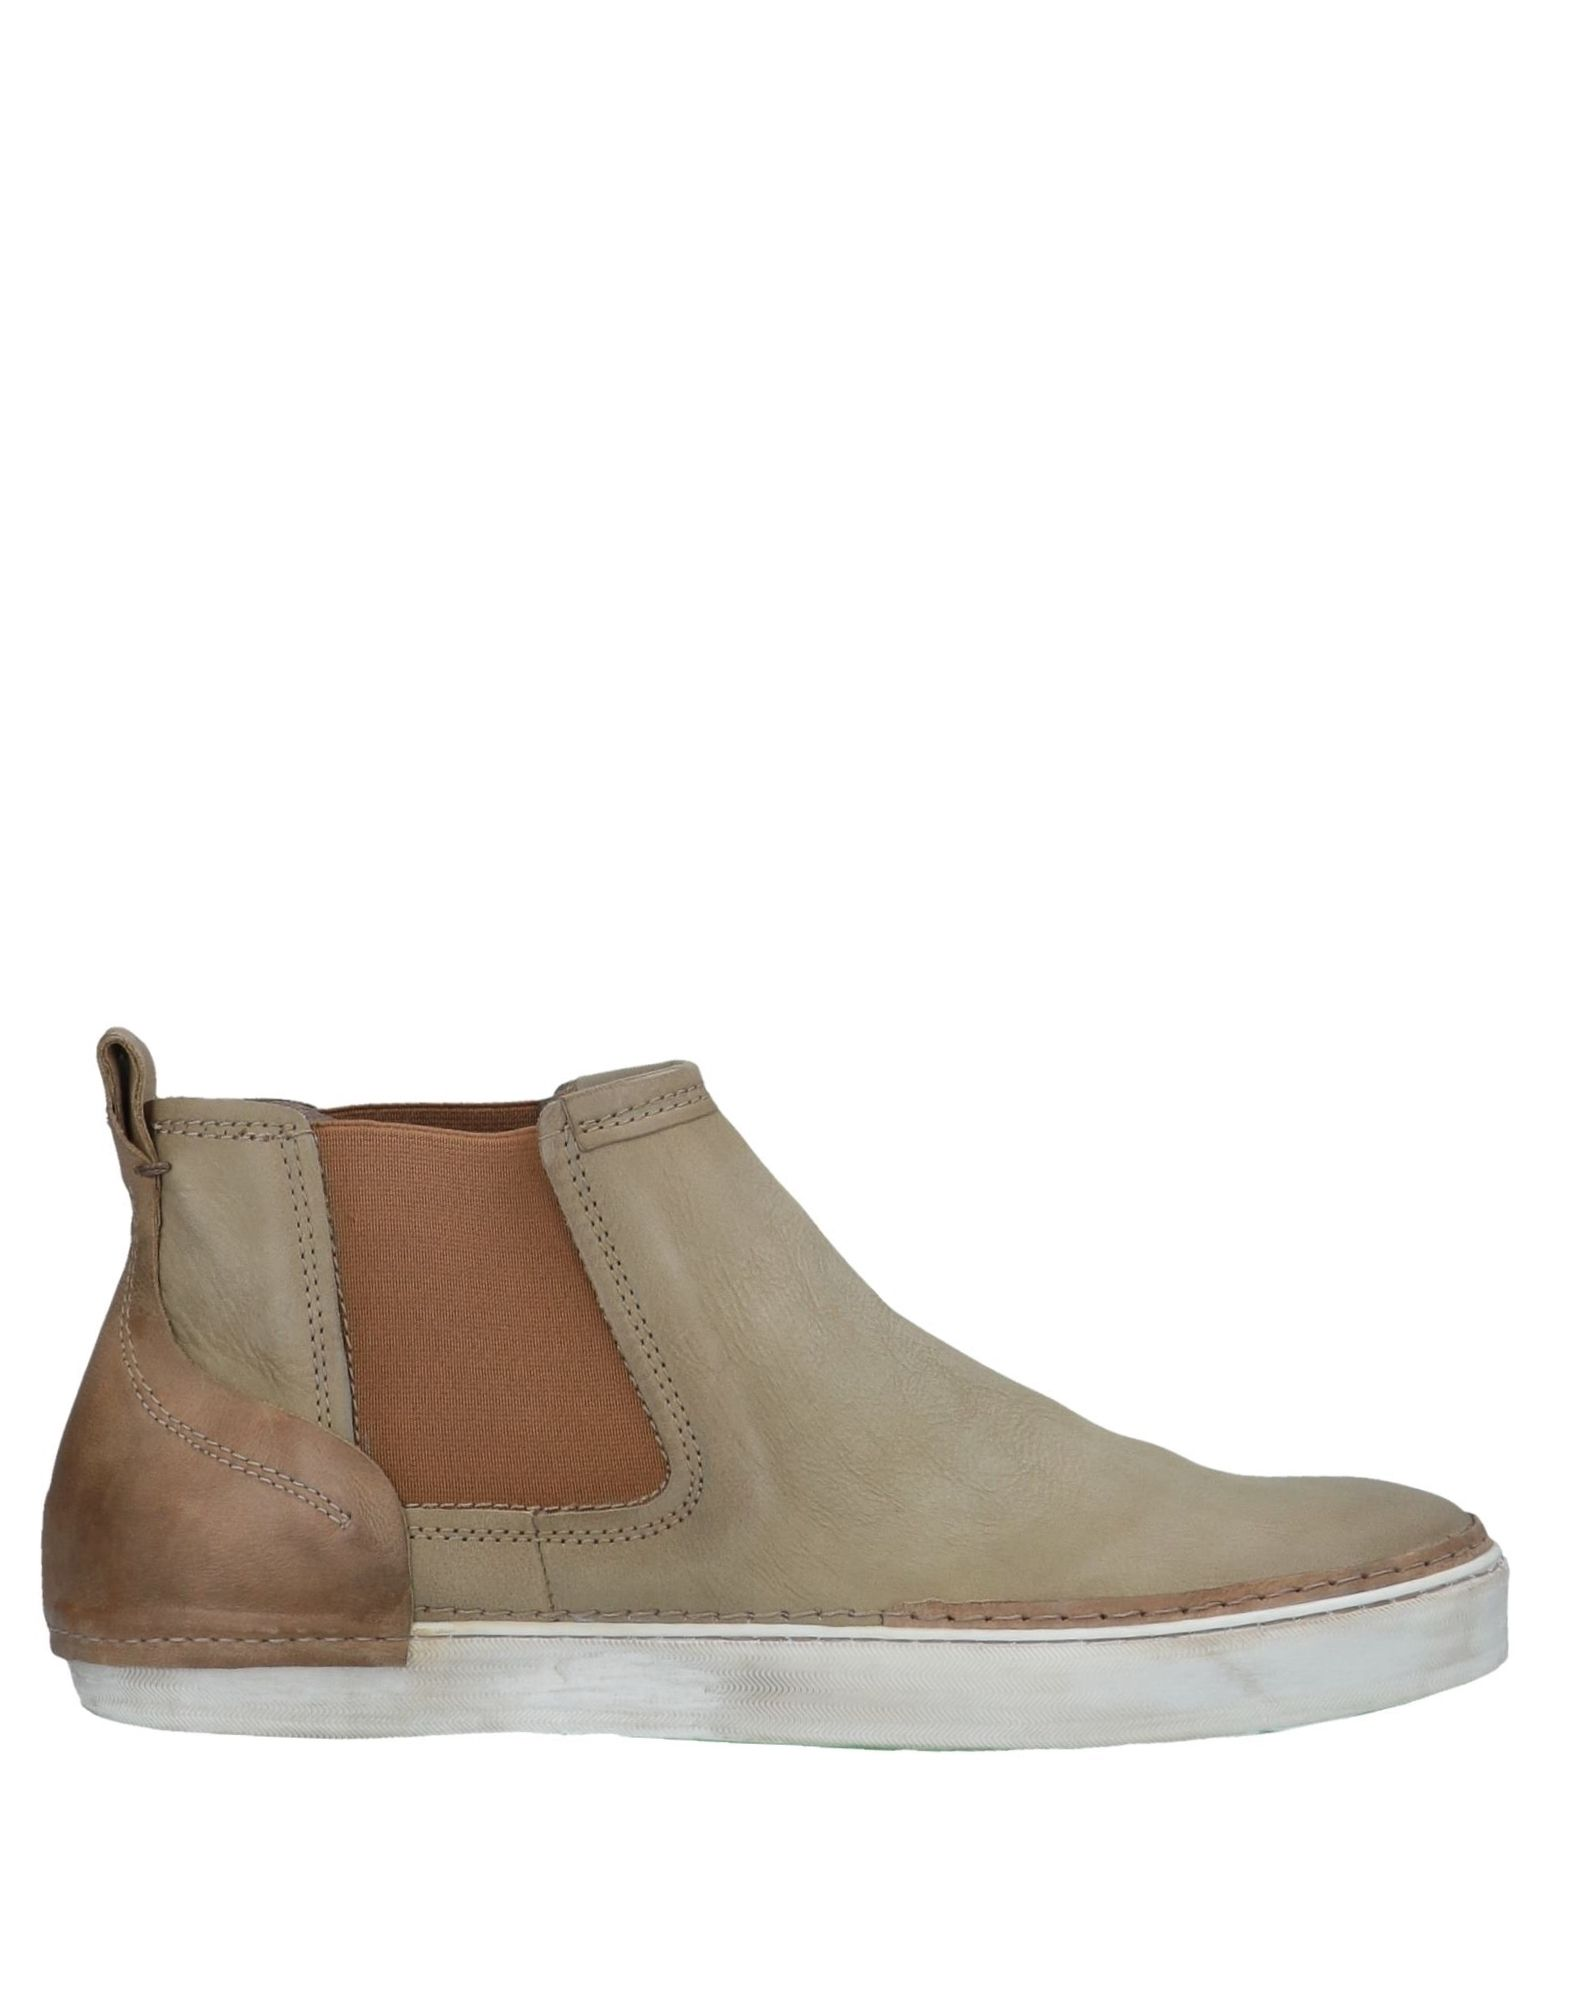 Rabatt Schuhe echte Schuhe Rabatt Mjus Rbl Stiefelette Herren  11538130AW 9d2772